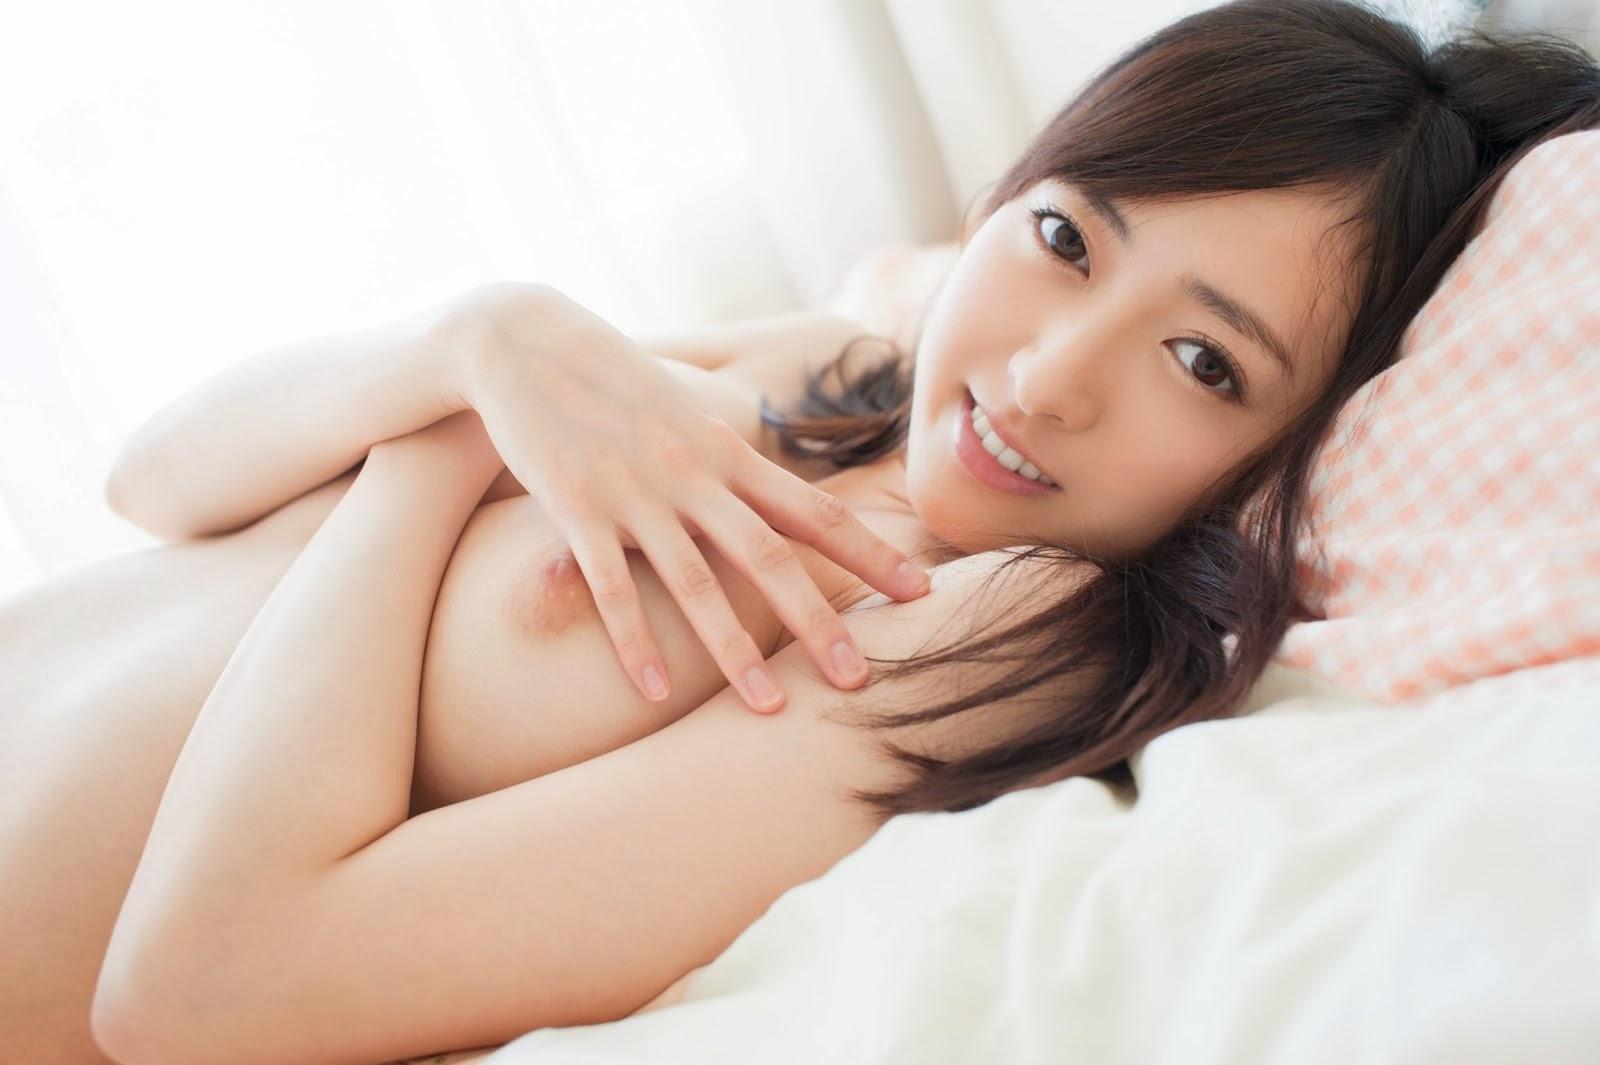 Heaven in The World: AKB48 - Risa Tachibana